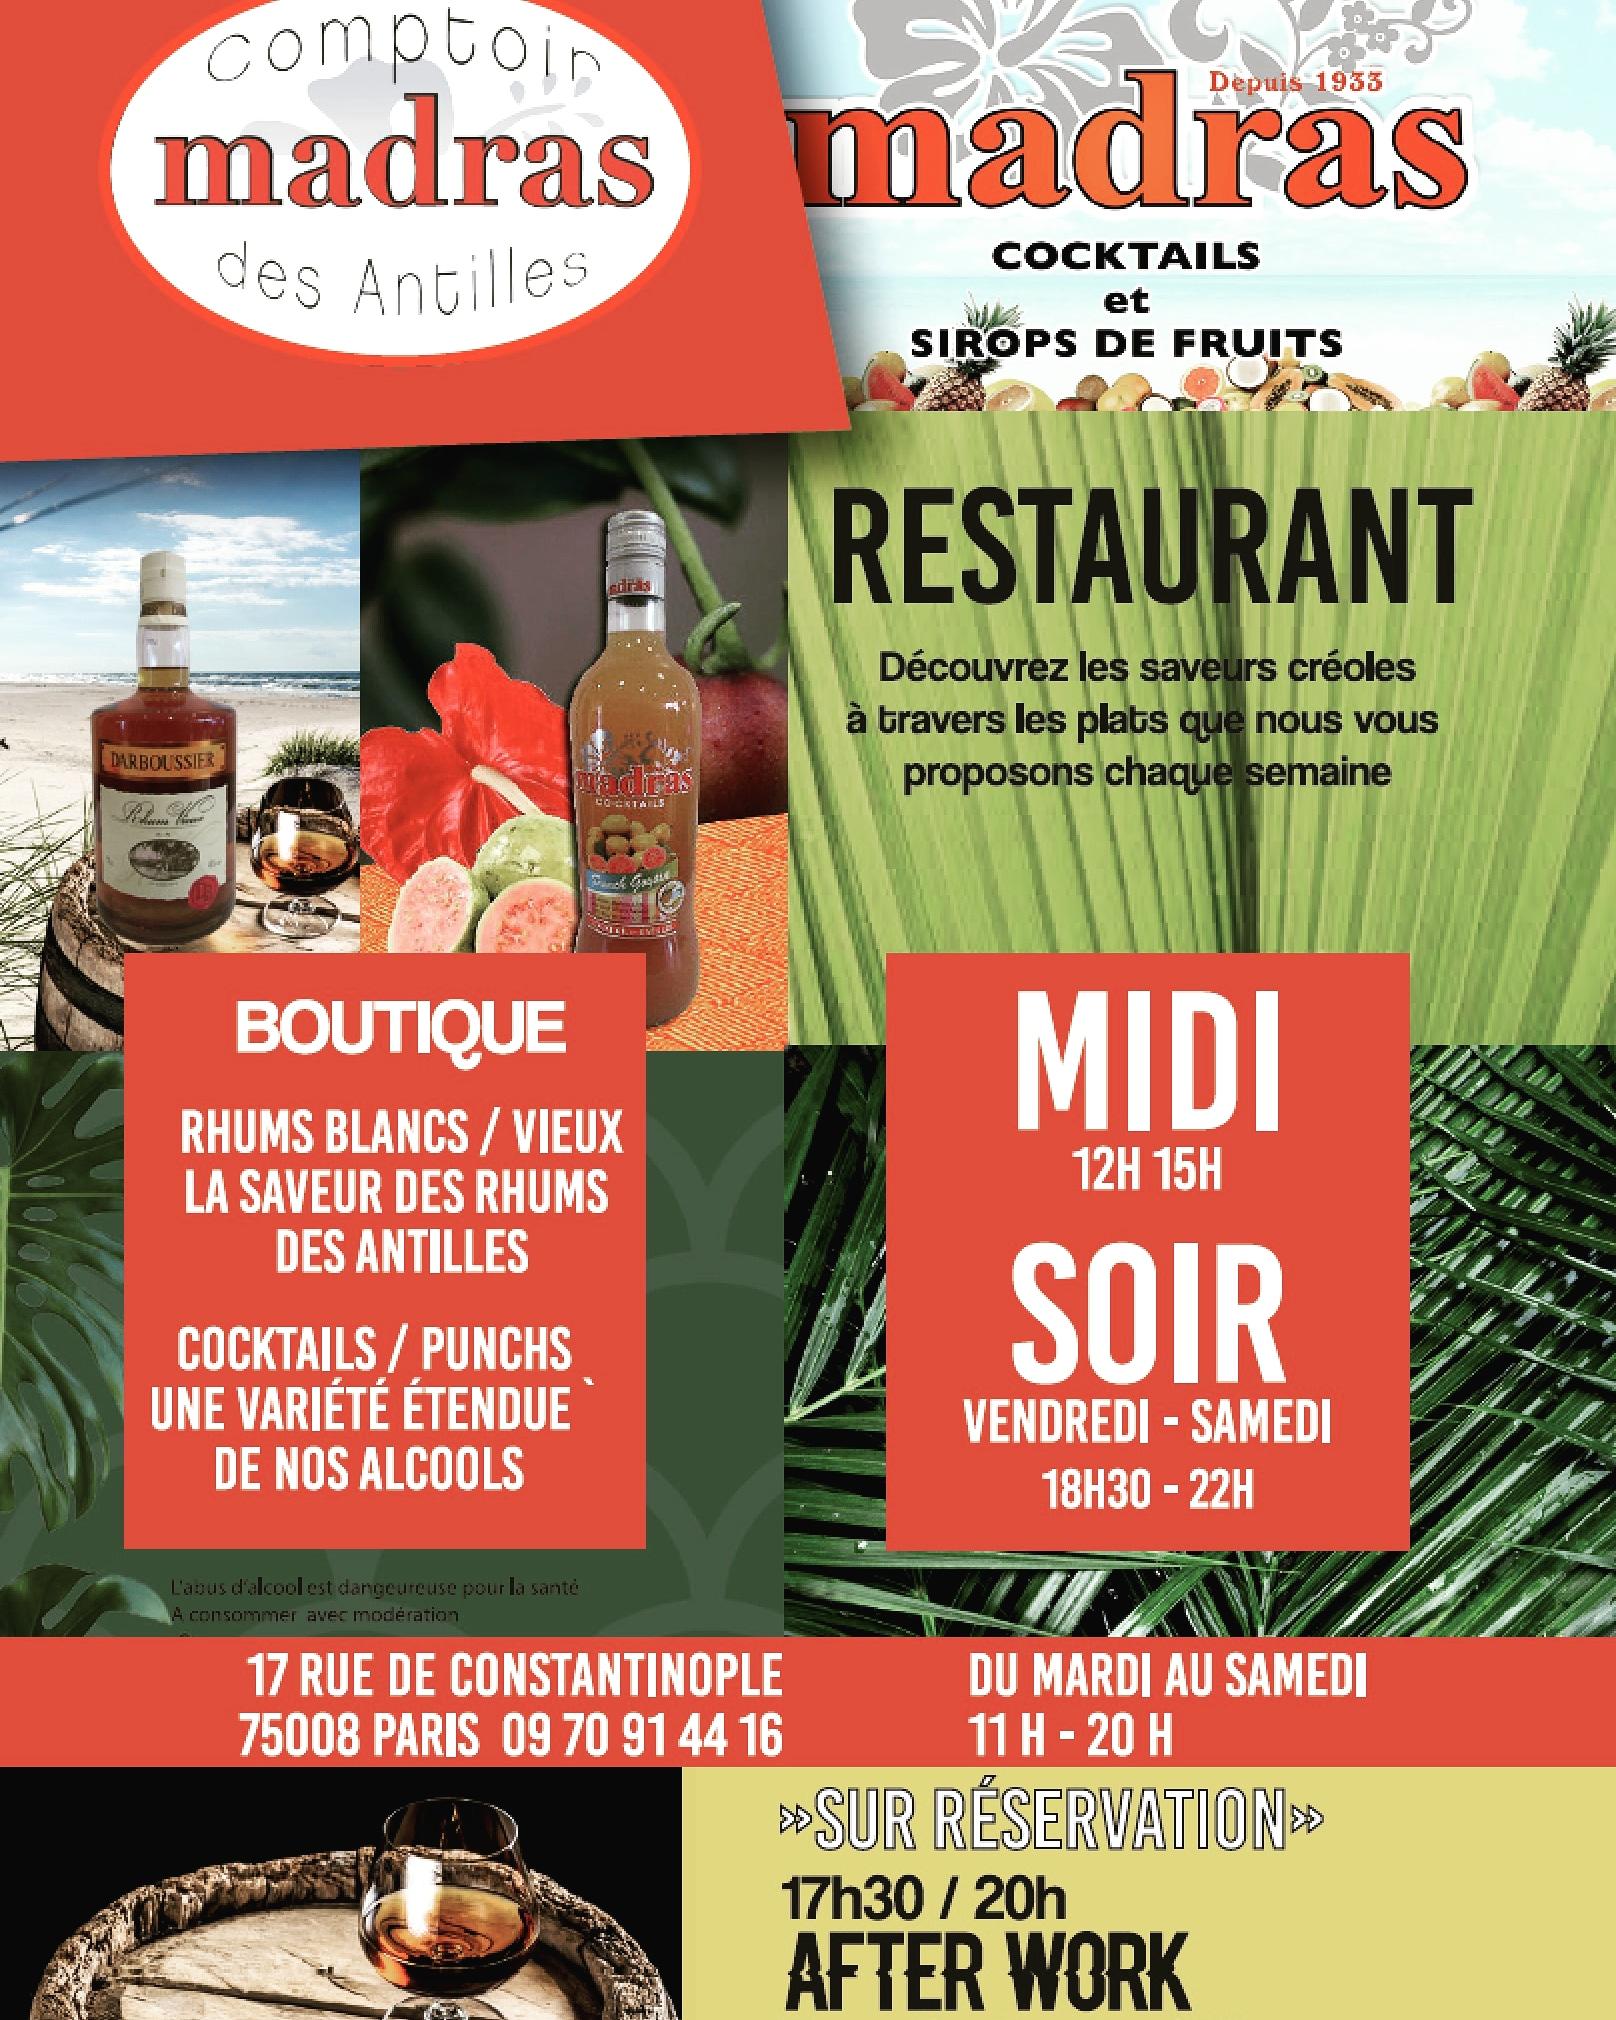 Rhumerie et restaurant Comptoir Madras des Antilles